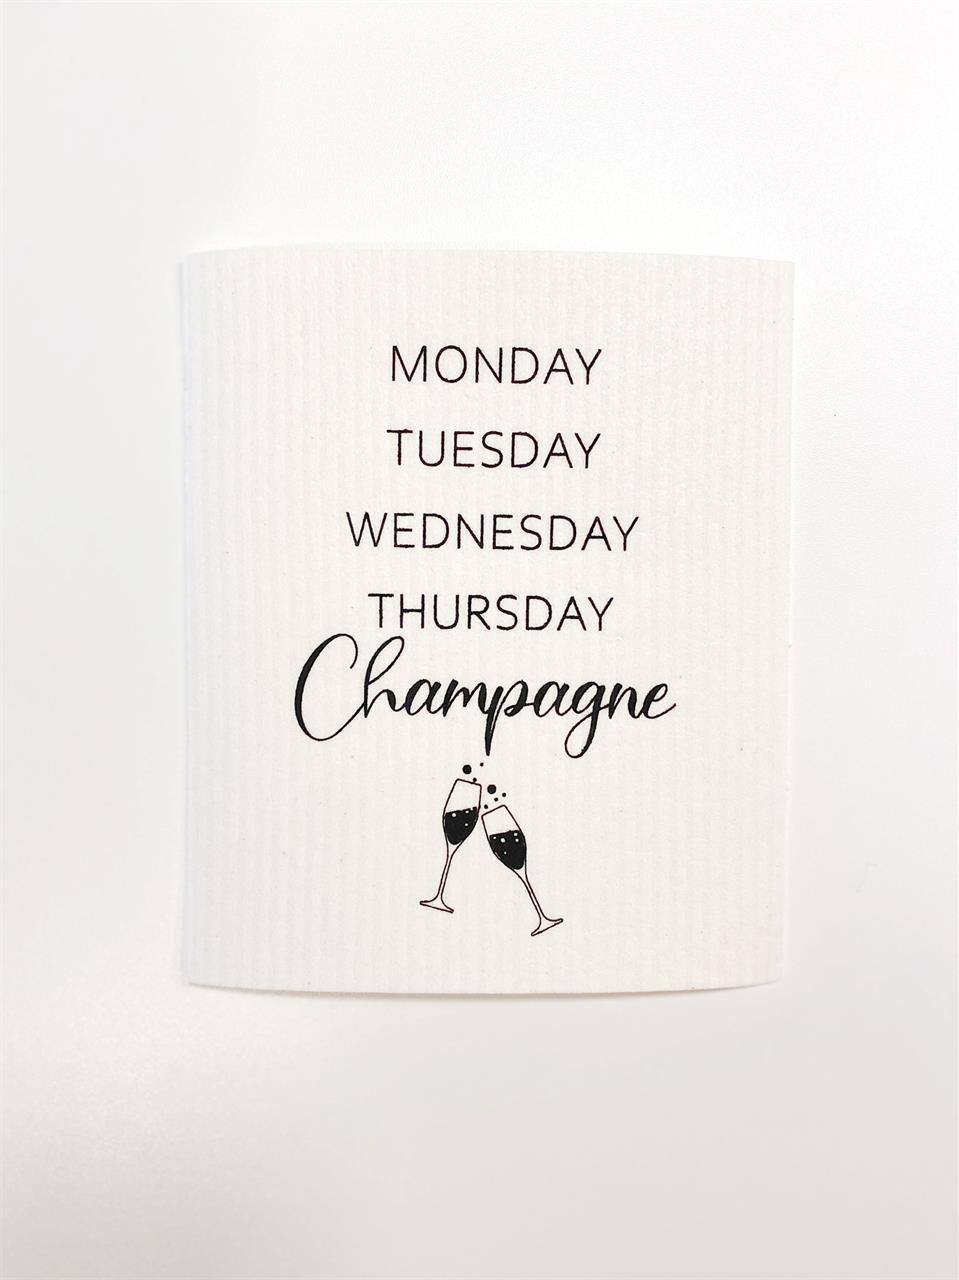 Disktrasa, Monday-Champagne, vit/svart text